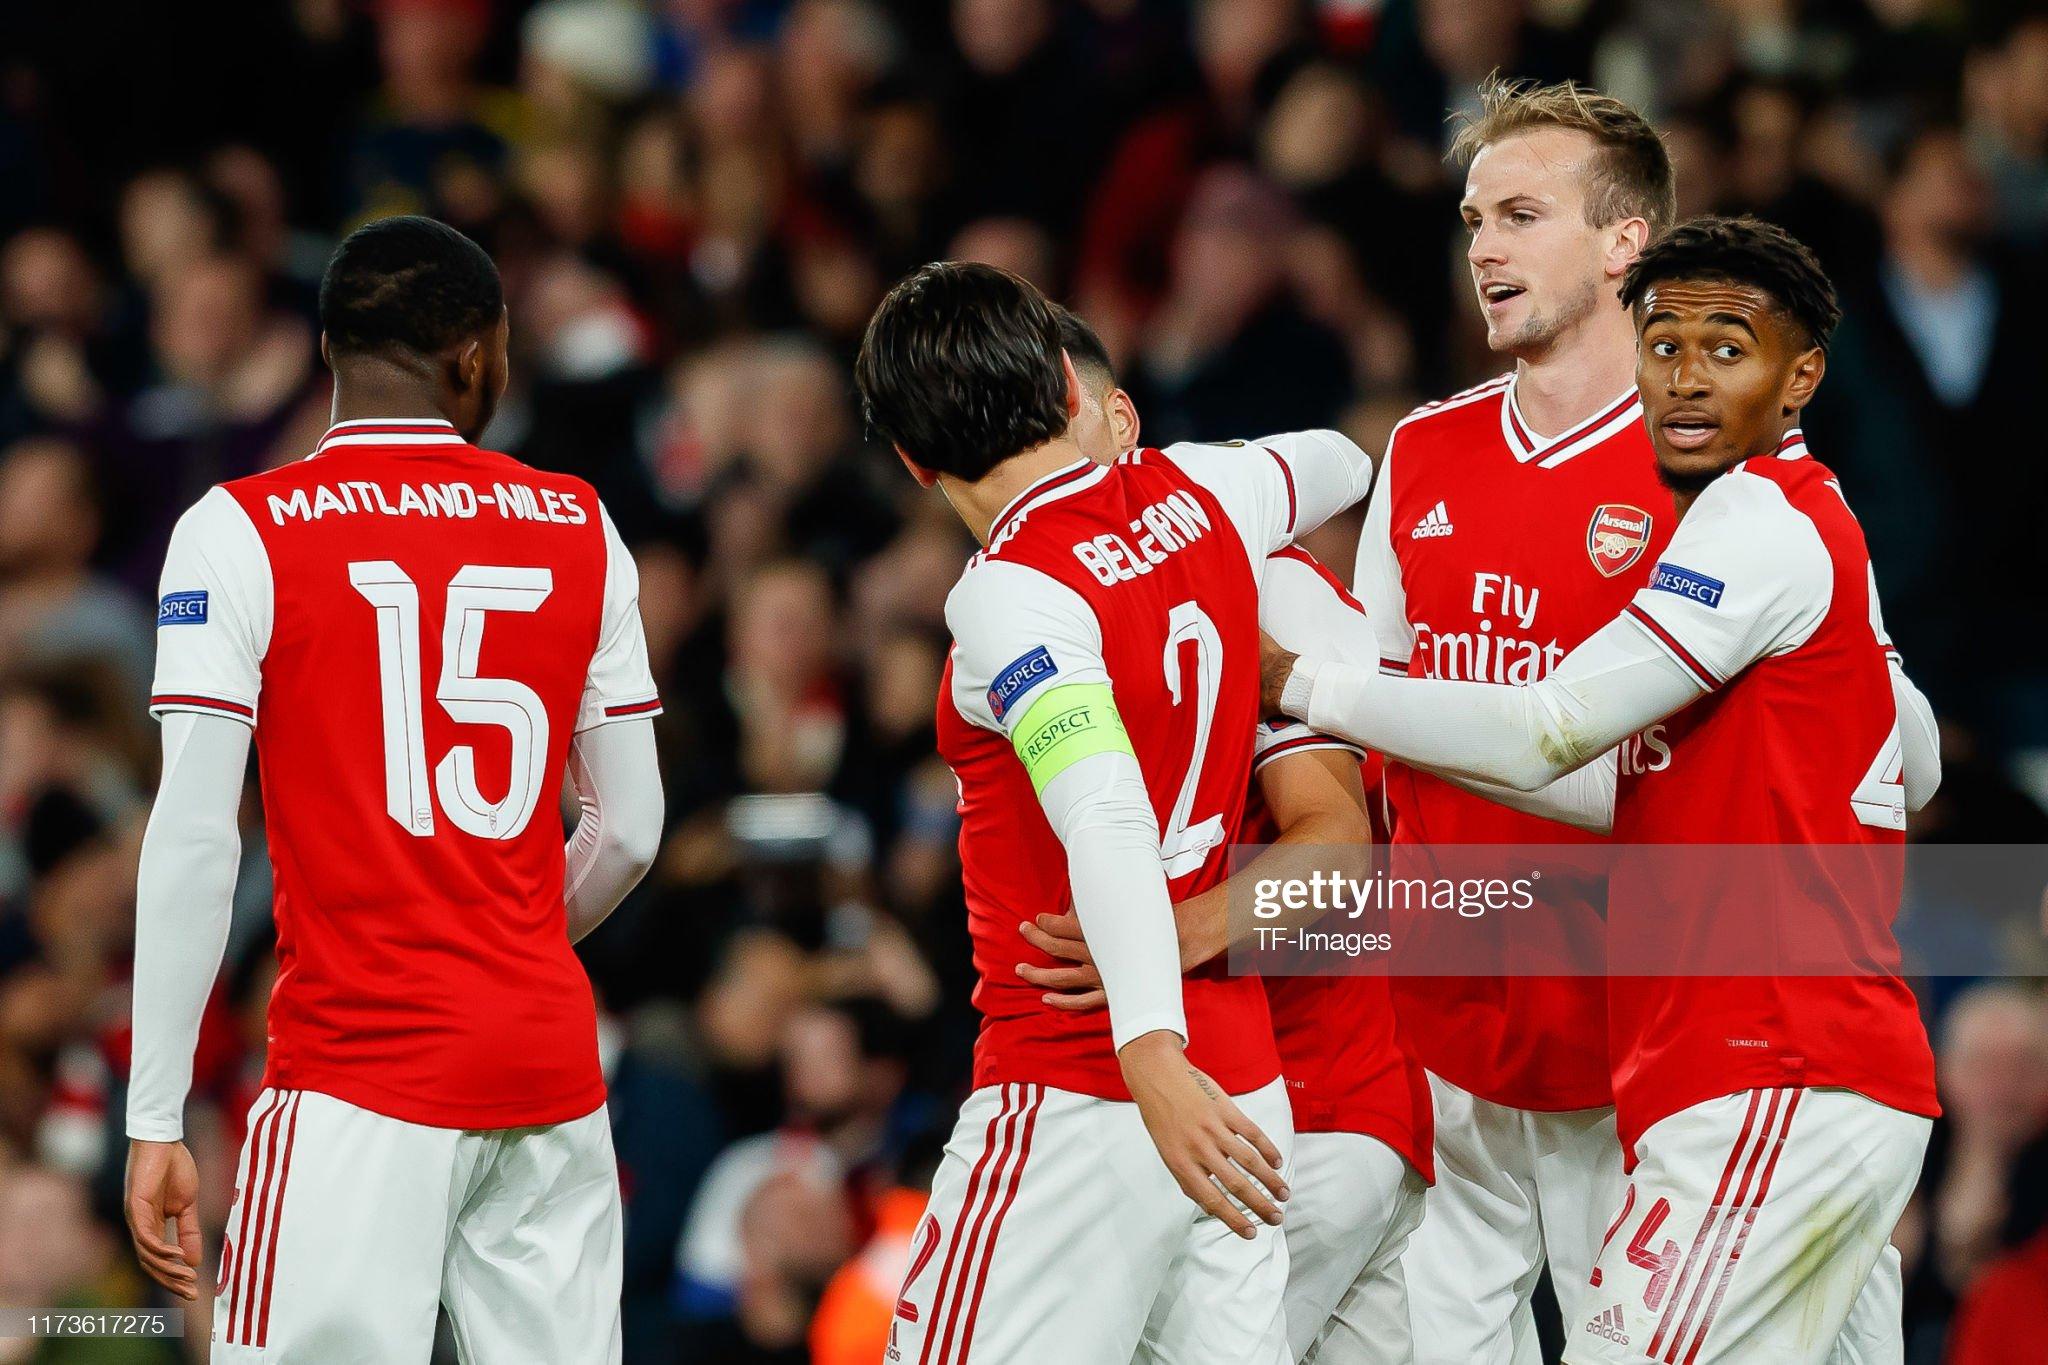 Arsenal & Wolves thrive as Man United struggle